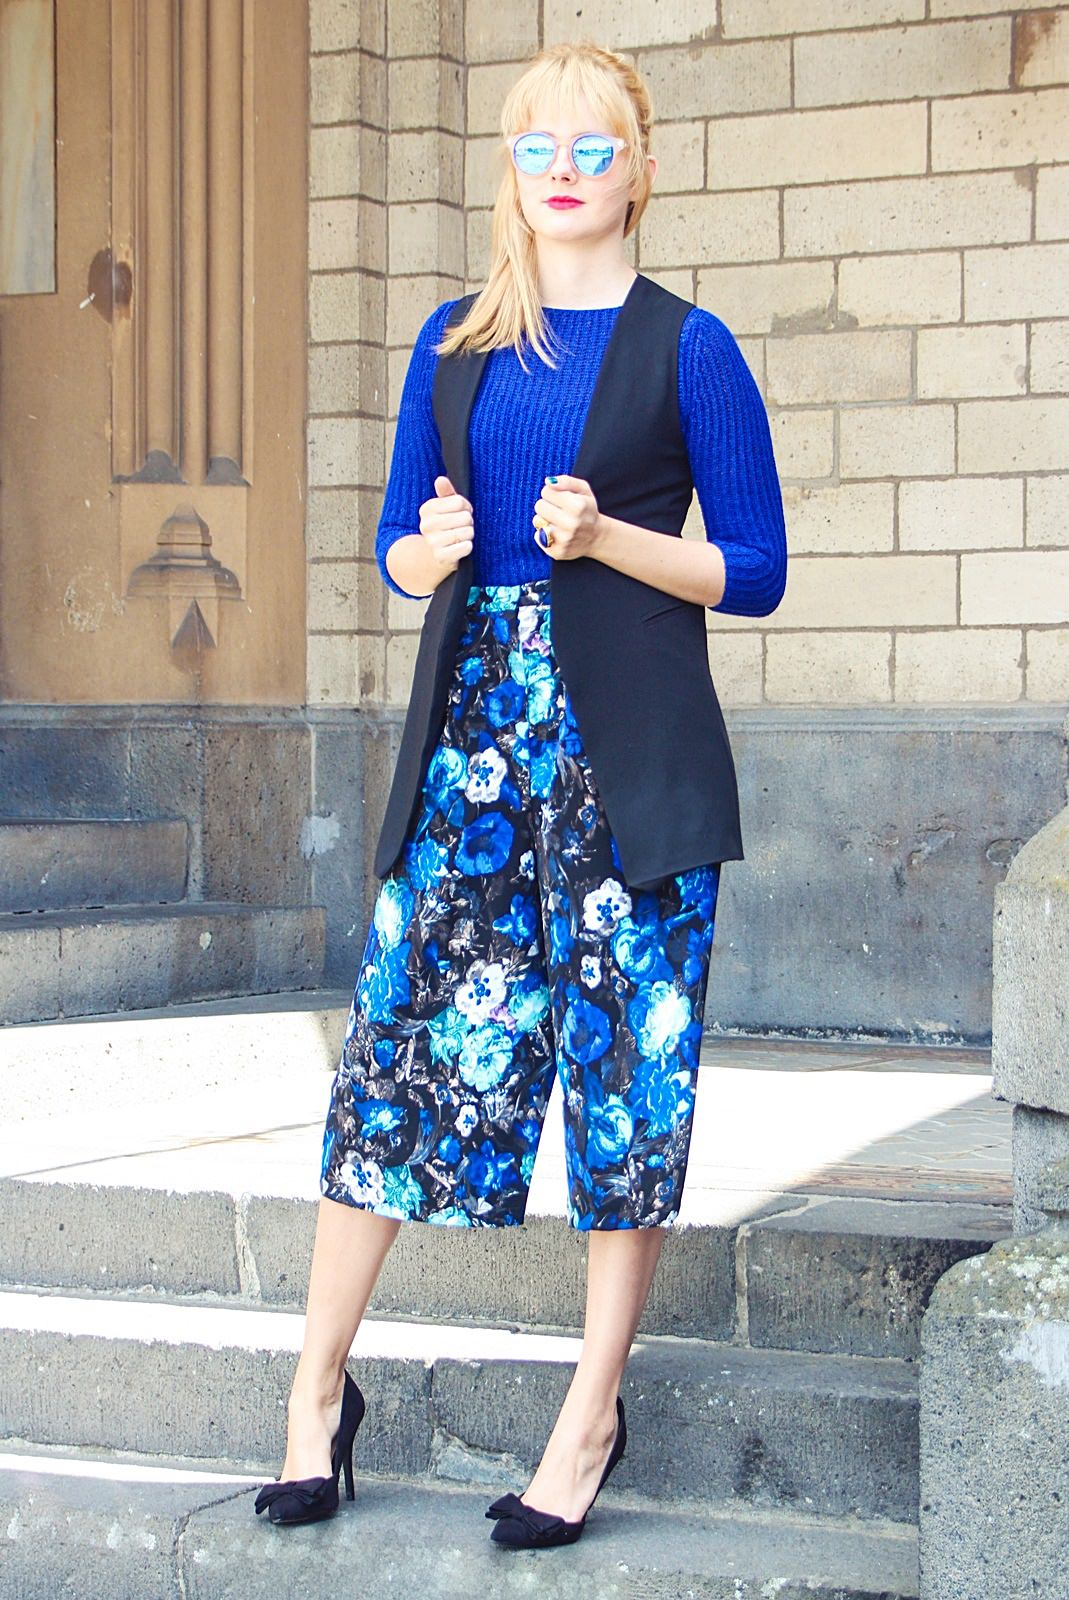 Des Belles Choses_Culotte_Floral Spring Trend 3